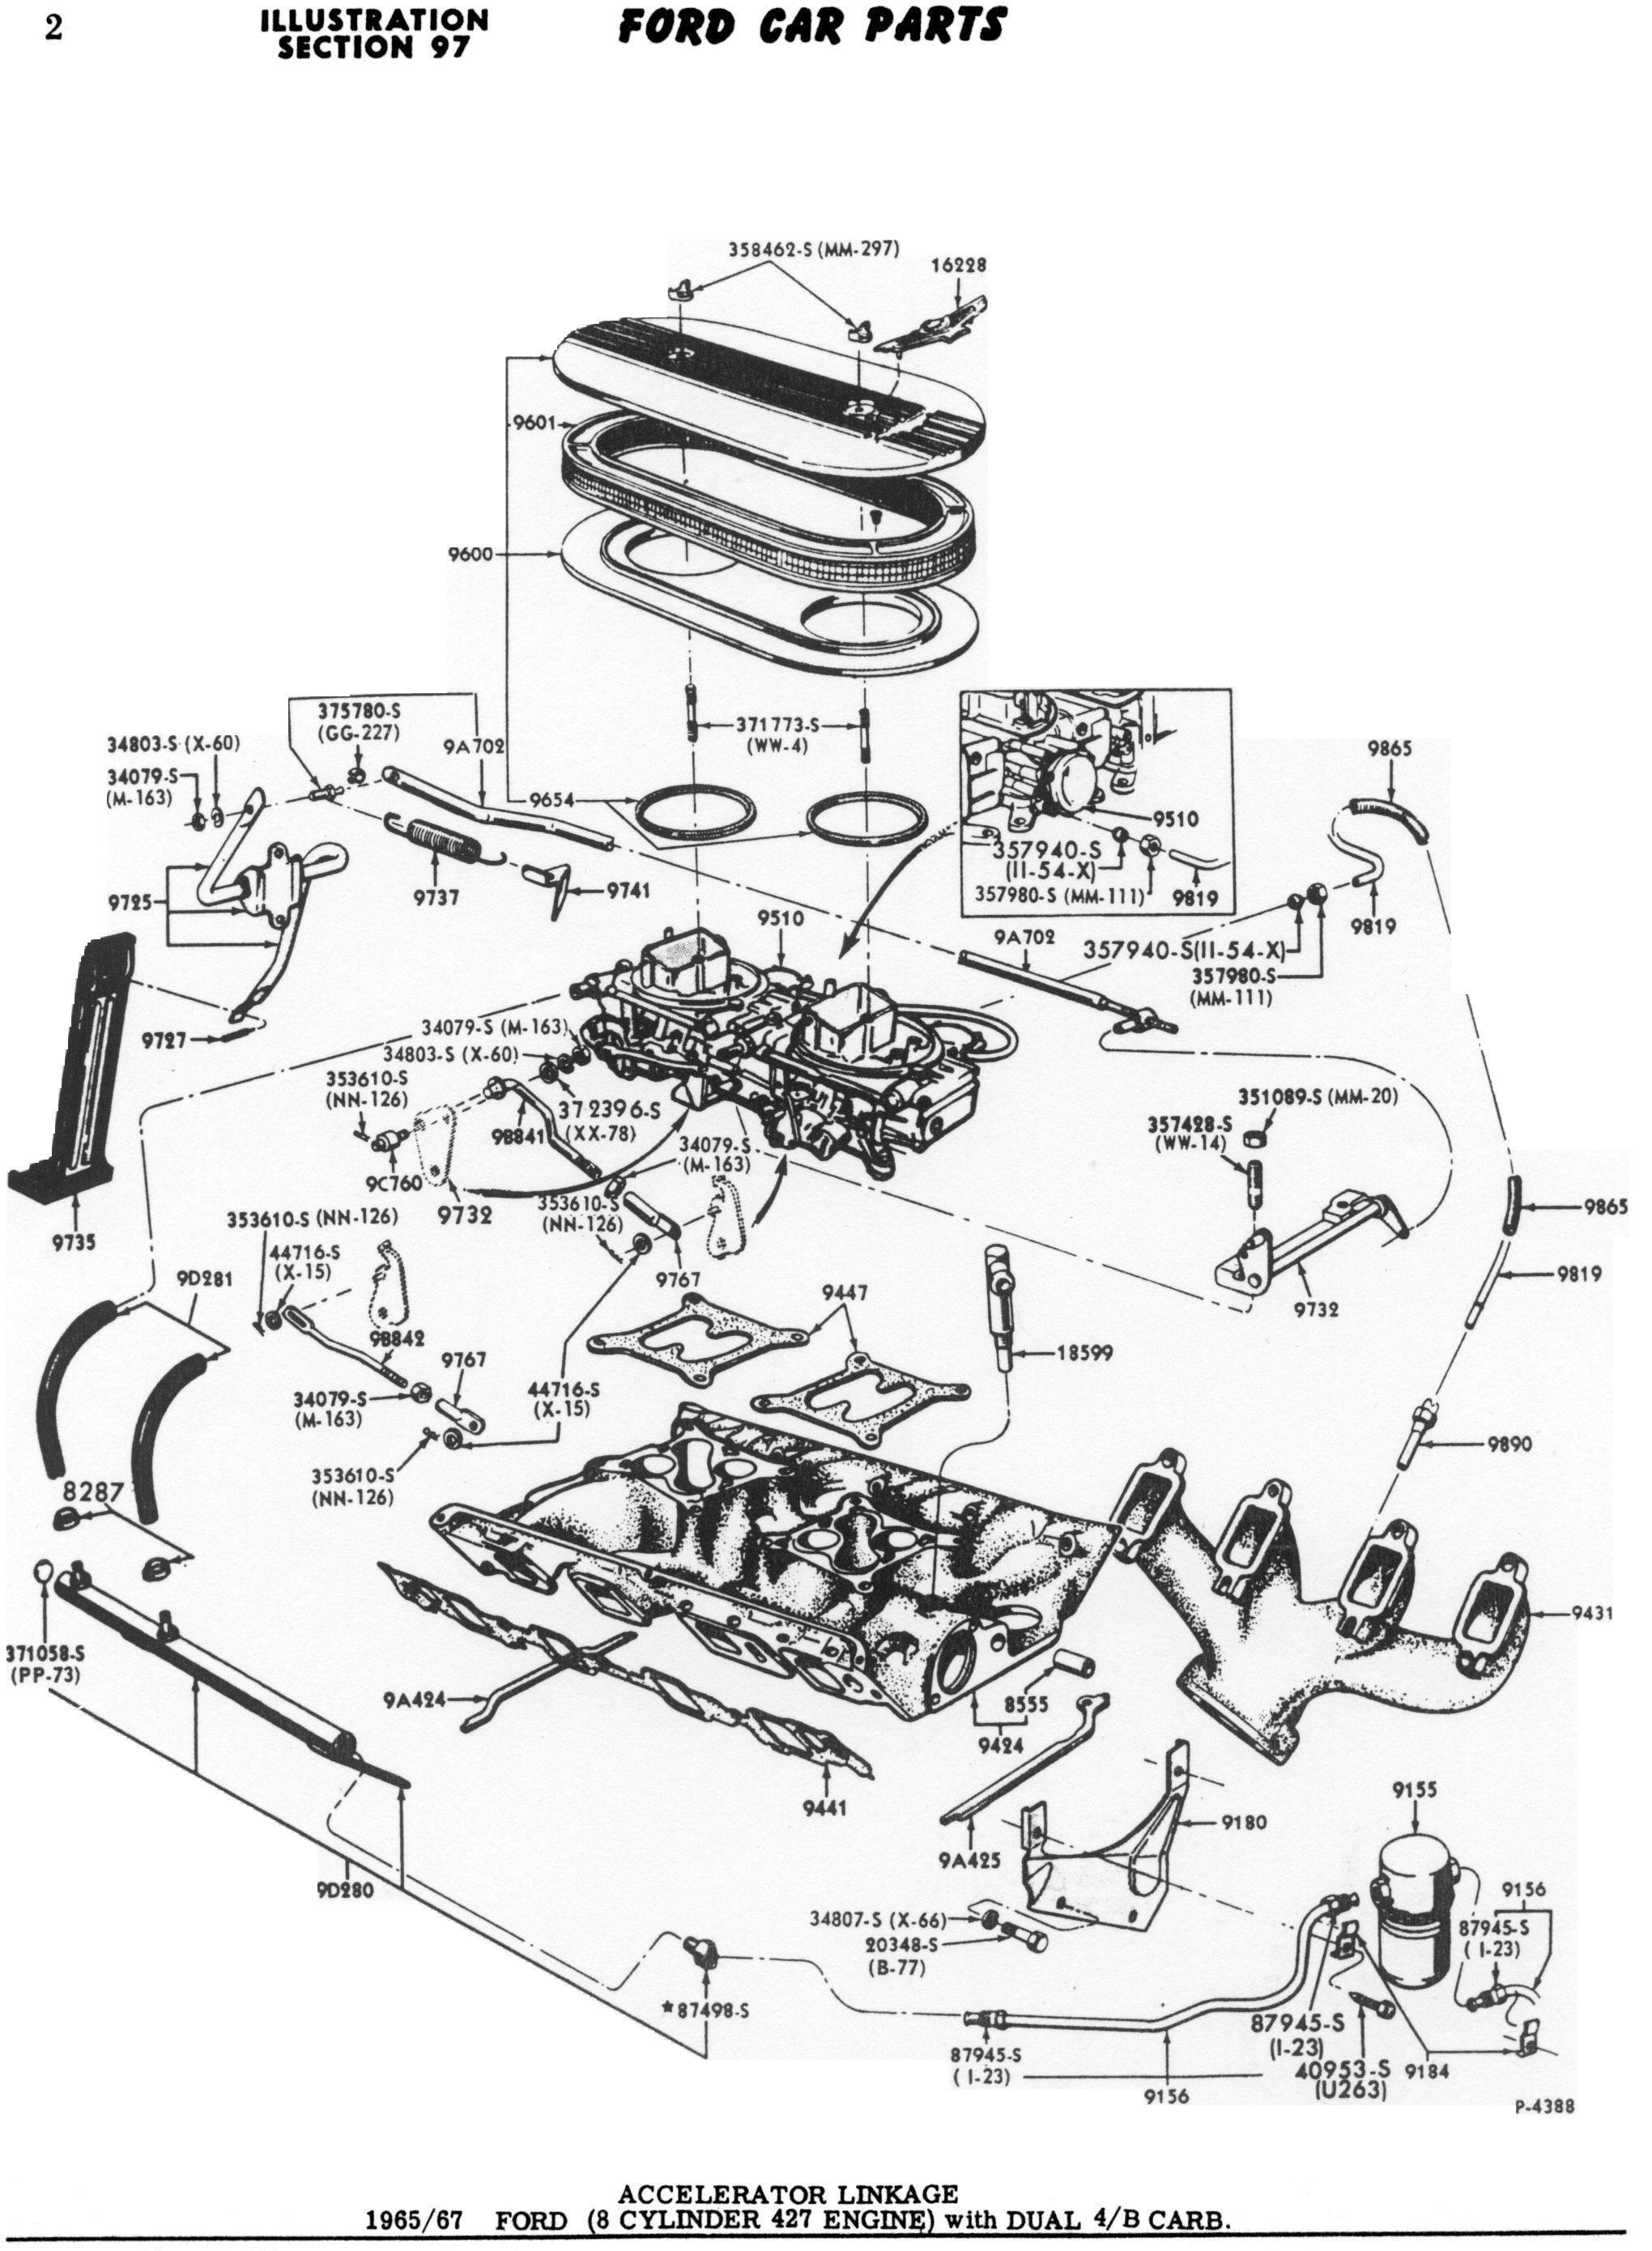 [DIAGRAM_1CA]  TK_8868] Ford Mustang 289 Engine Diagram 1966 Engine Car Parts And Component | 1966 Ford Mustang Engine Diagram |  | Lopla Boapu Mohammedshrine Librar Wiring 101